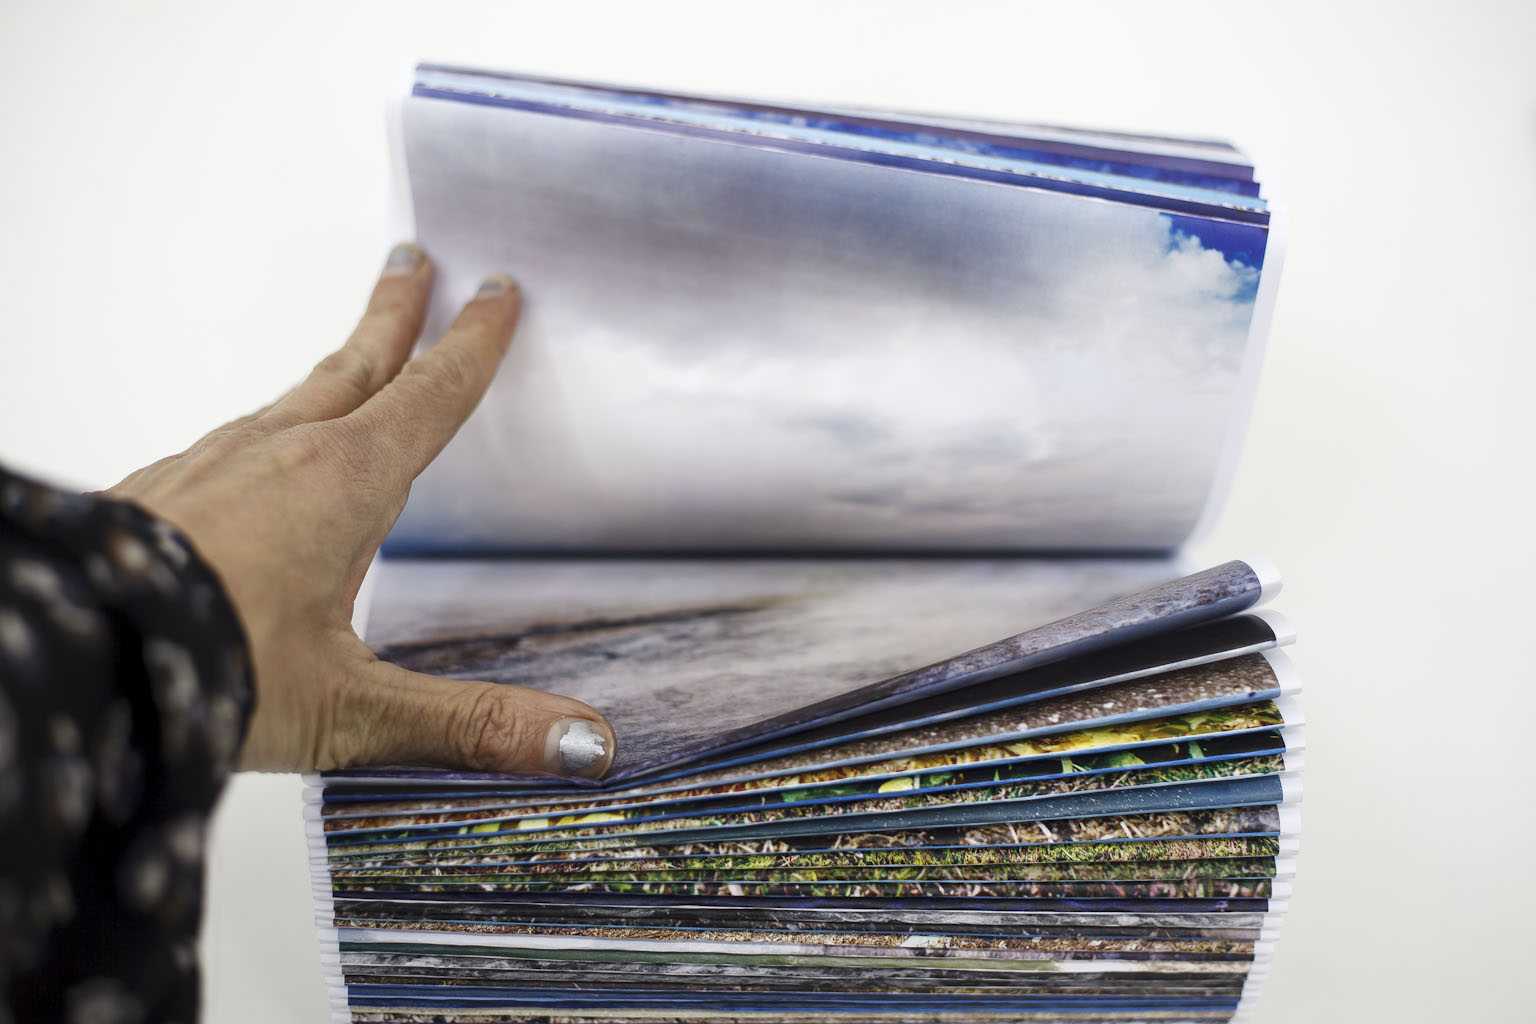 Page Turner#1- Photography, The Book and Self-Publishing , exhibition view Exhibition, 6th Lisbon Photobook Fair, Arquivo Municipal De Lisboa, 2015